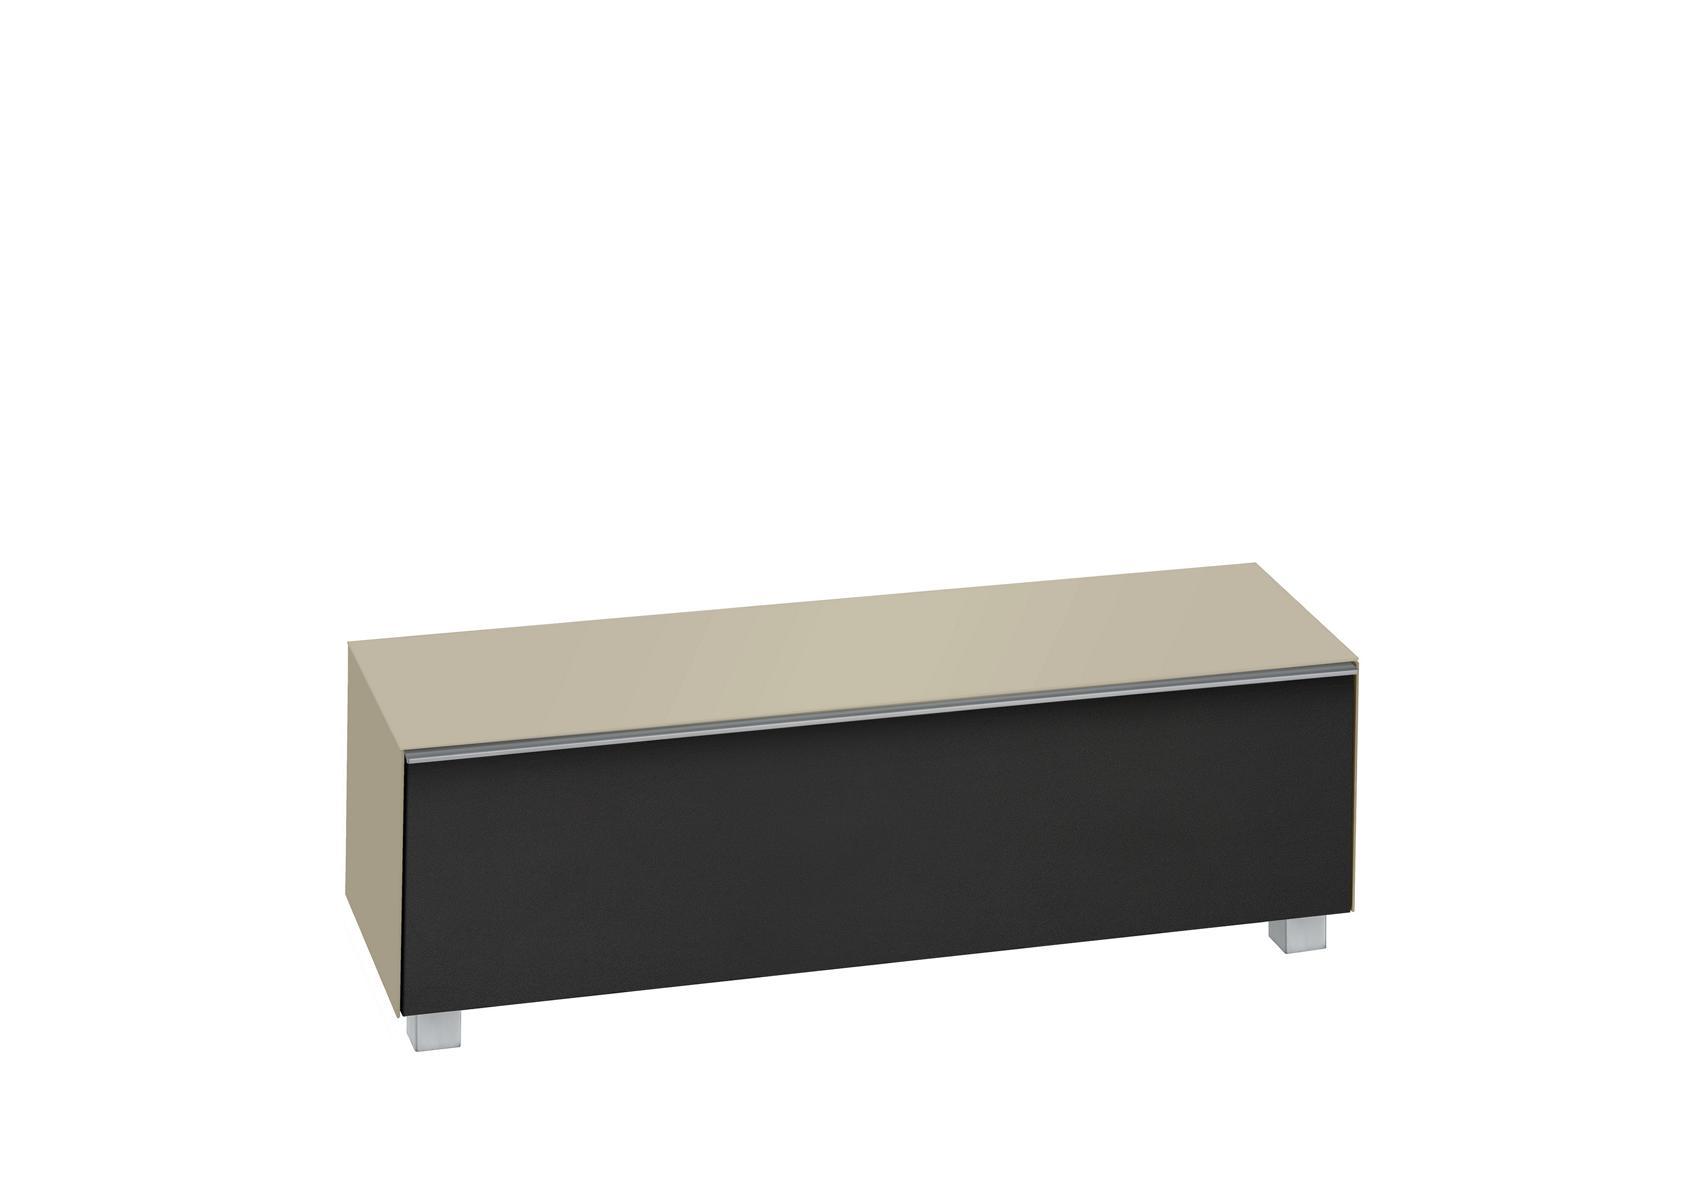 tv lowboard unterschrank fernsehschrank soundsystem mod mj336 sandglas schwarz ebay. Black Bedroom Furniture Sets. Home Design Ideas